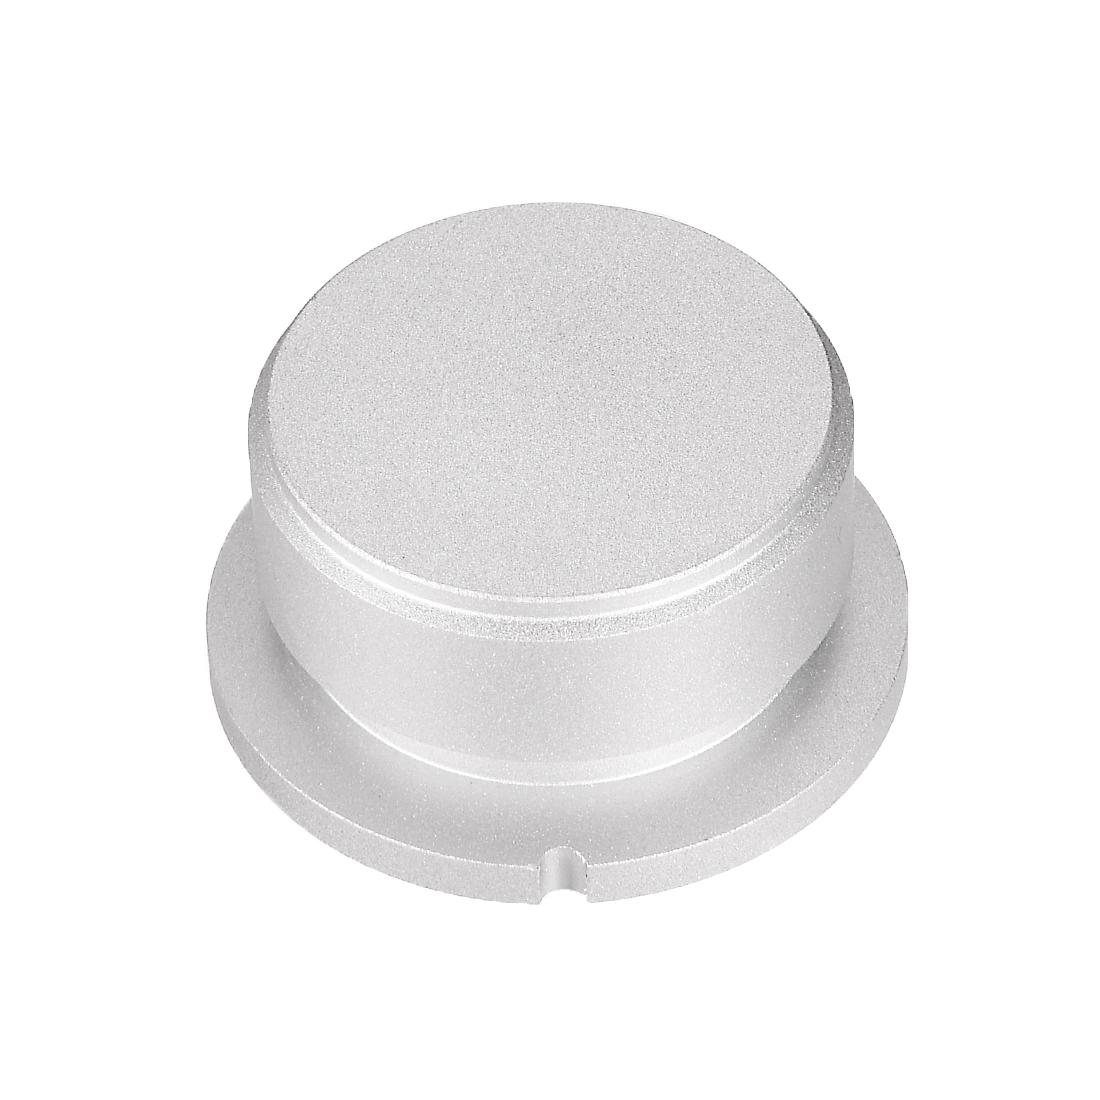 Stereo Knob, 38*6 mm Aluminium Alloy, Volume Control Knobs, Sliver